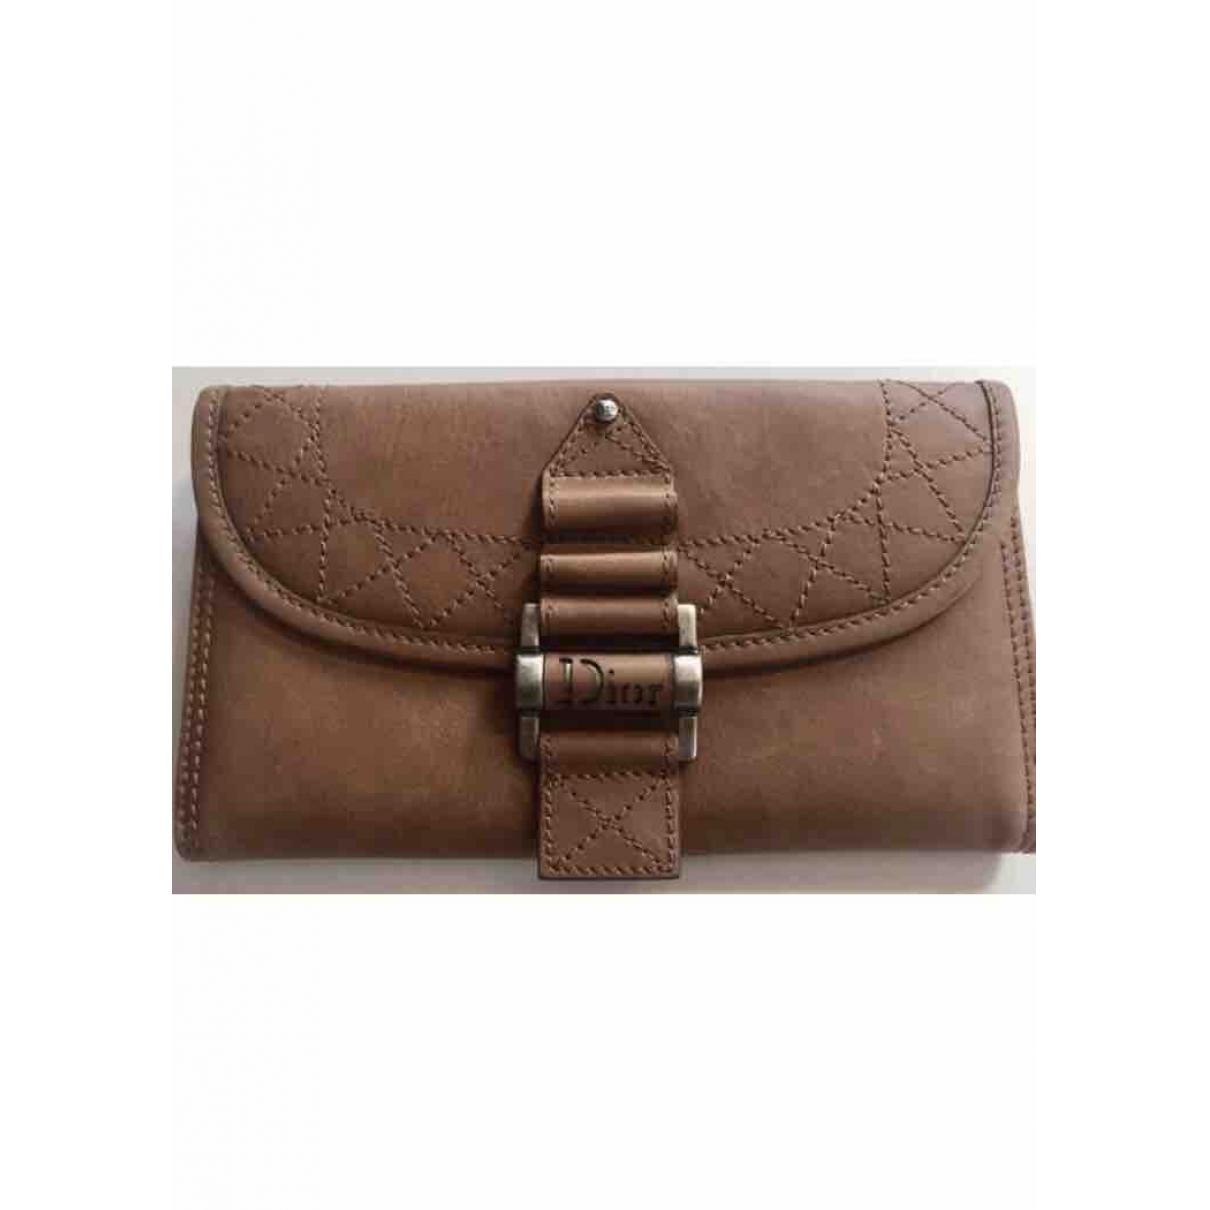 Dior \N Camel Leather wallet for Women \N